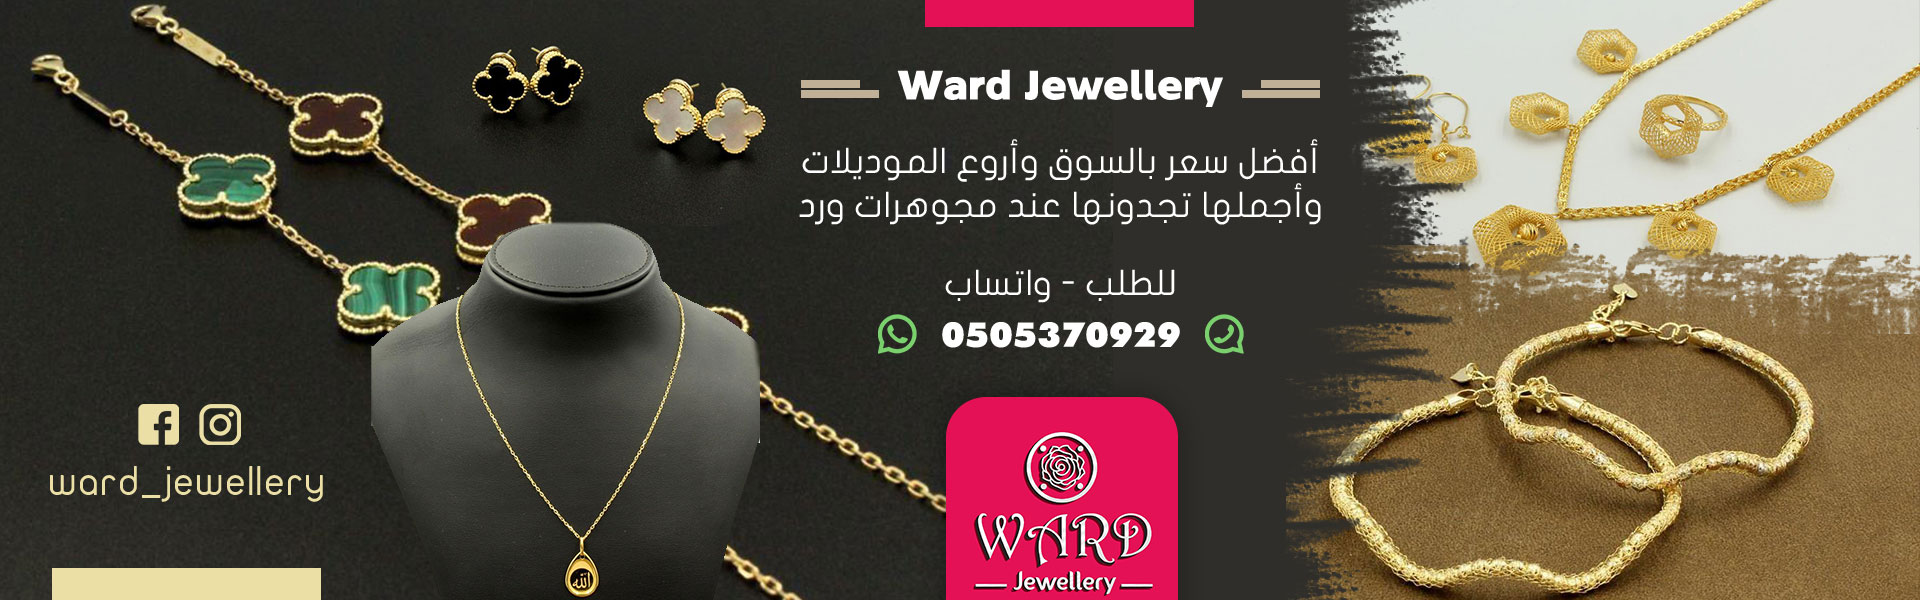 ward jewellery